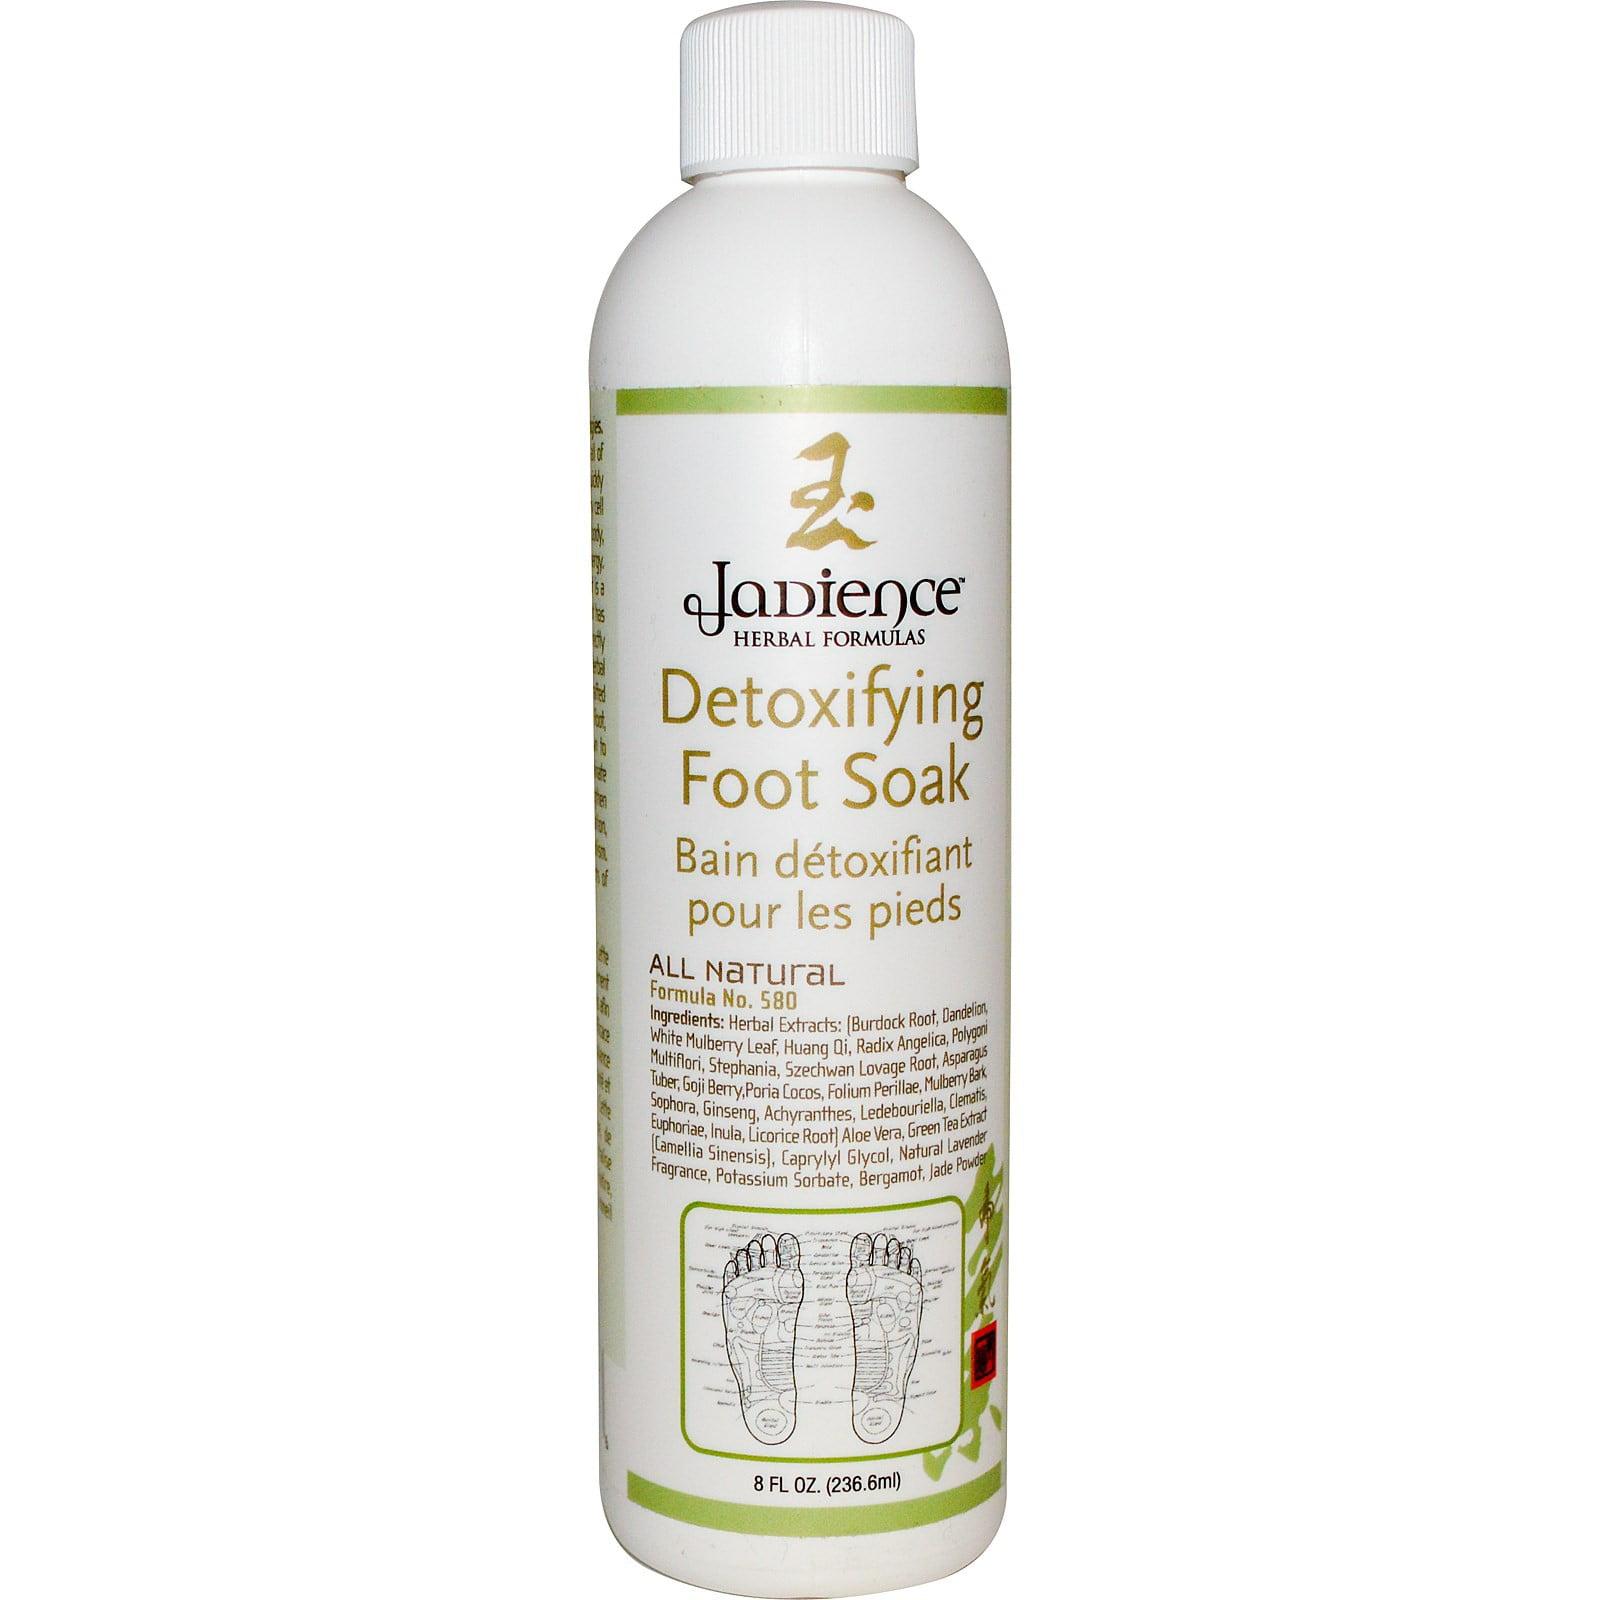 Jadience Herbal Formulas Detoxifying Foot Soak, 8 Oz